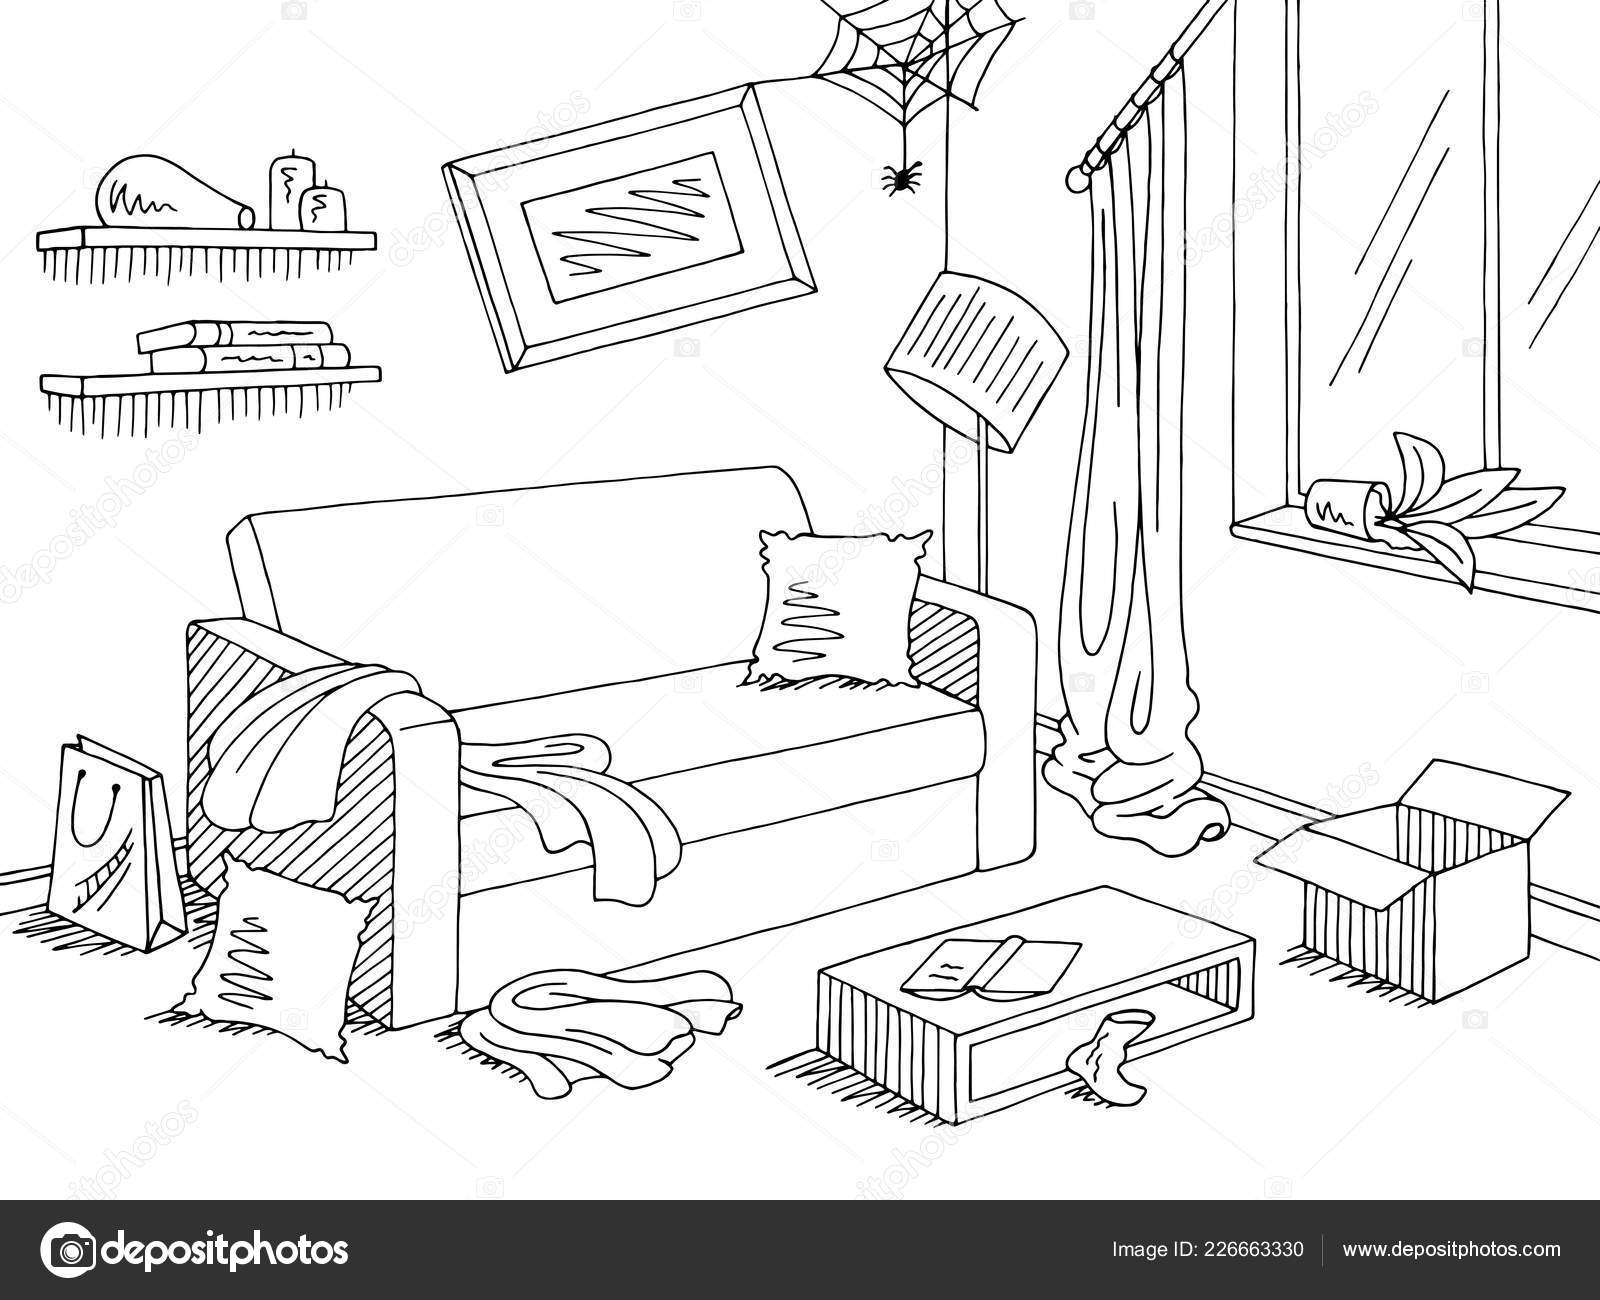 Mess Living Room Graphic Black White Home Interior Sketch